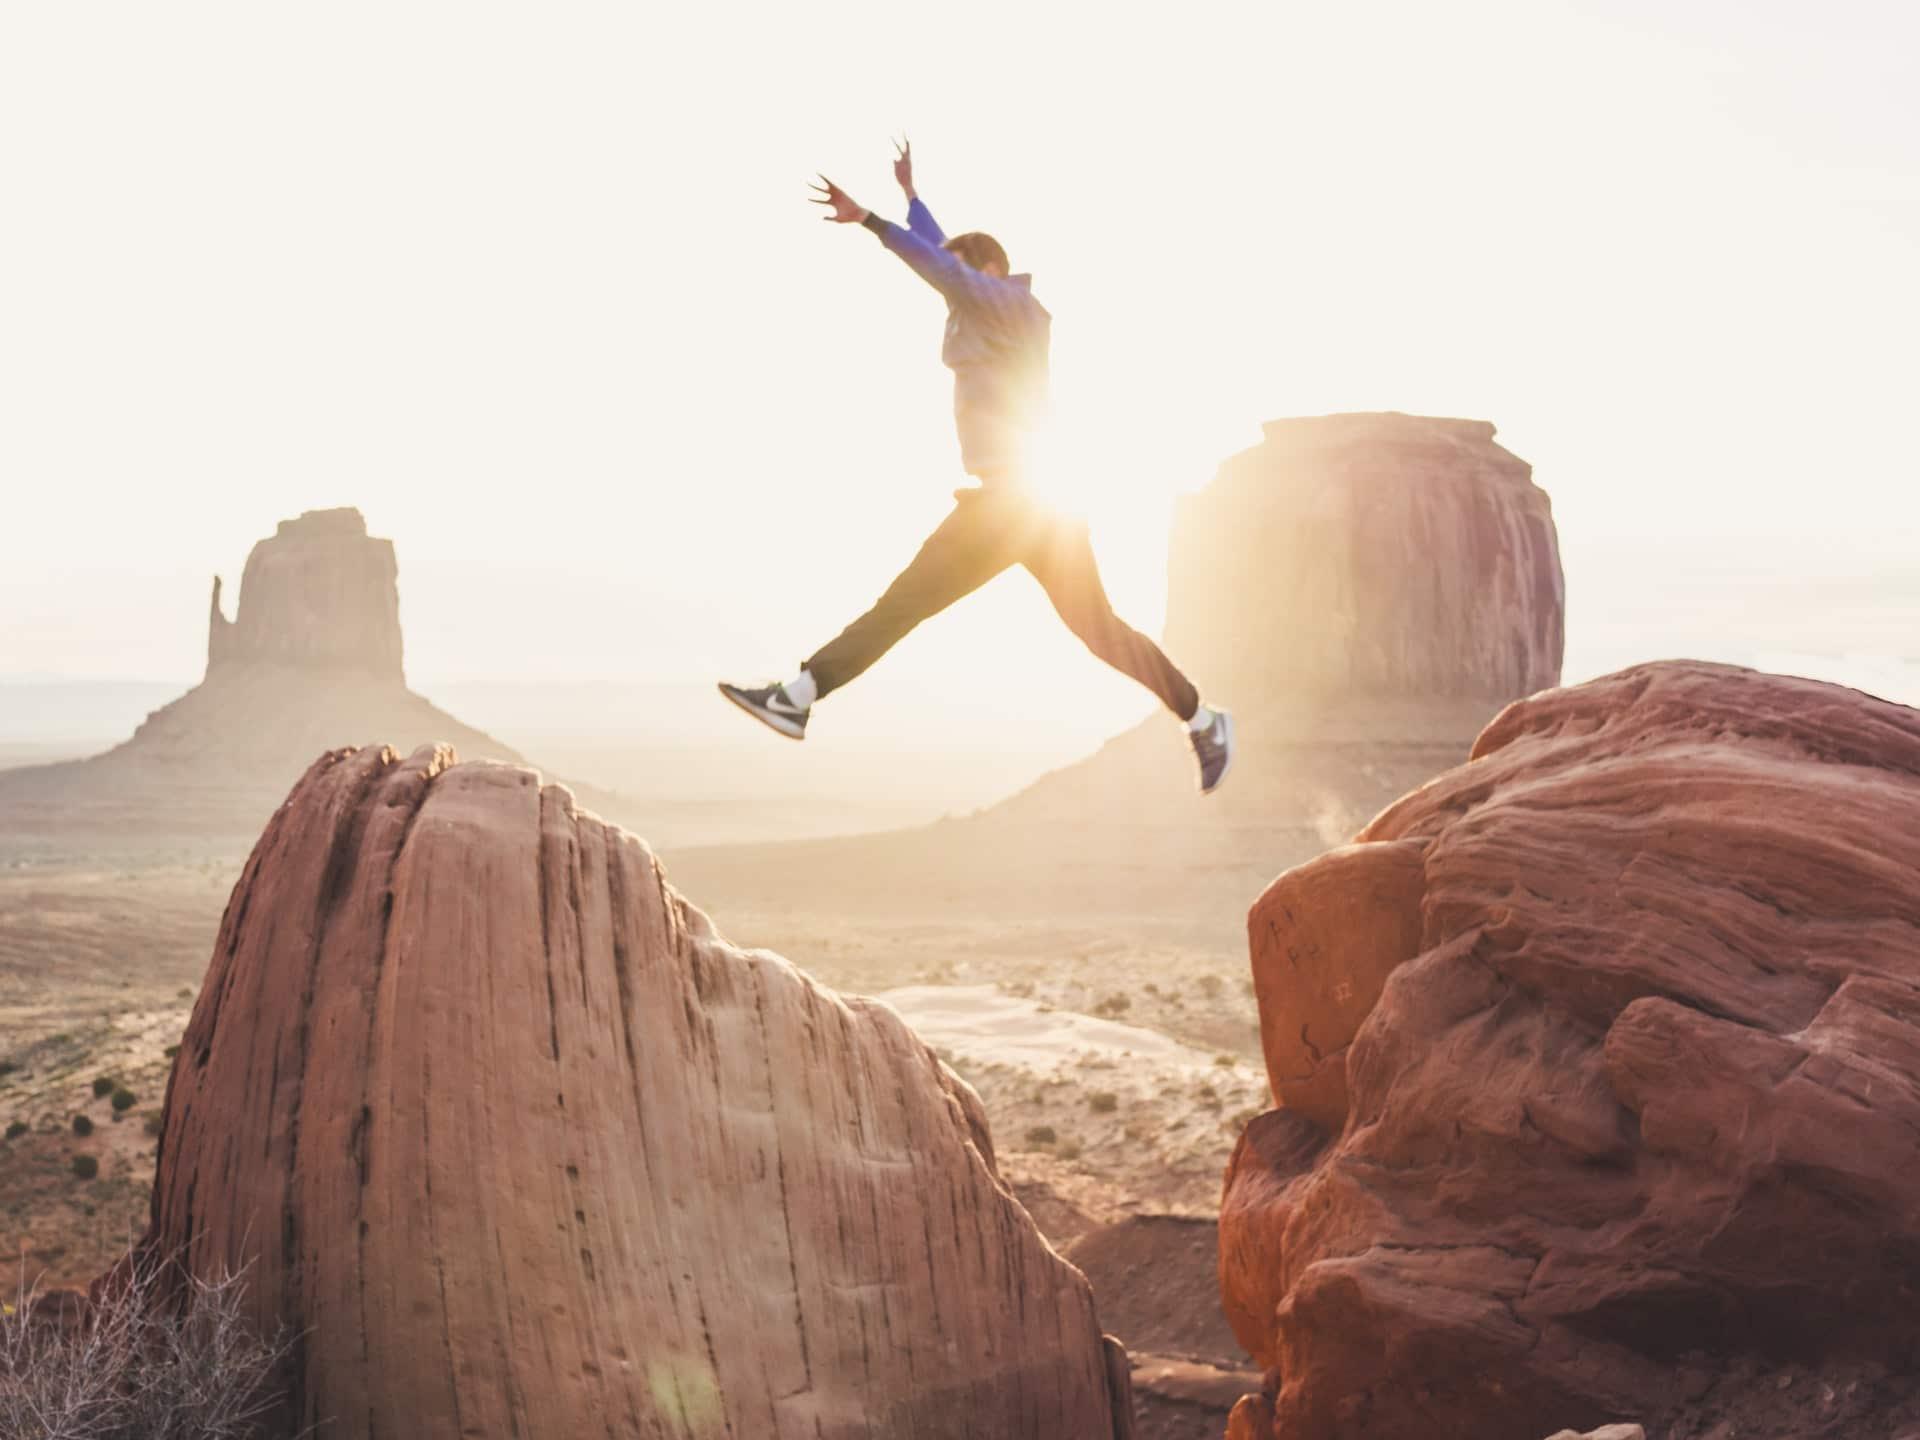 man jumping showing success